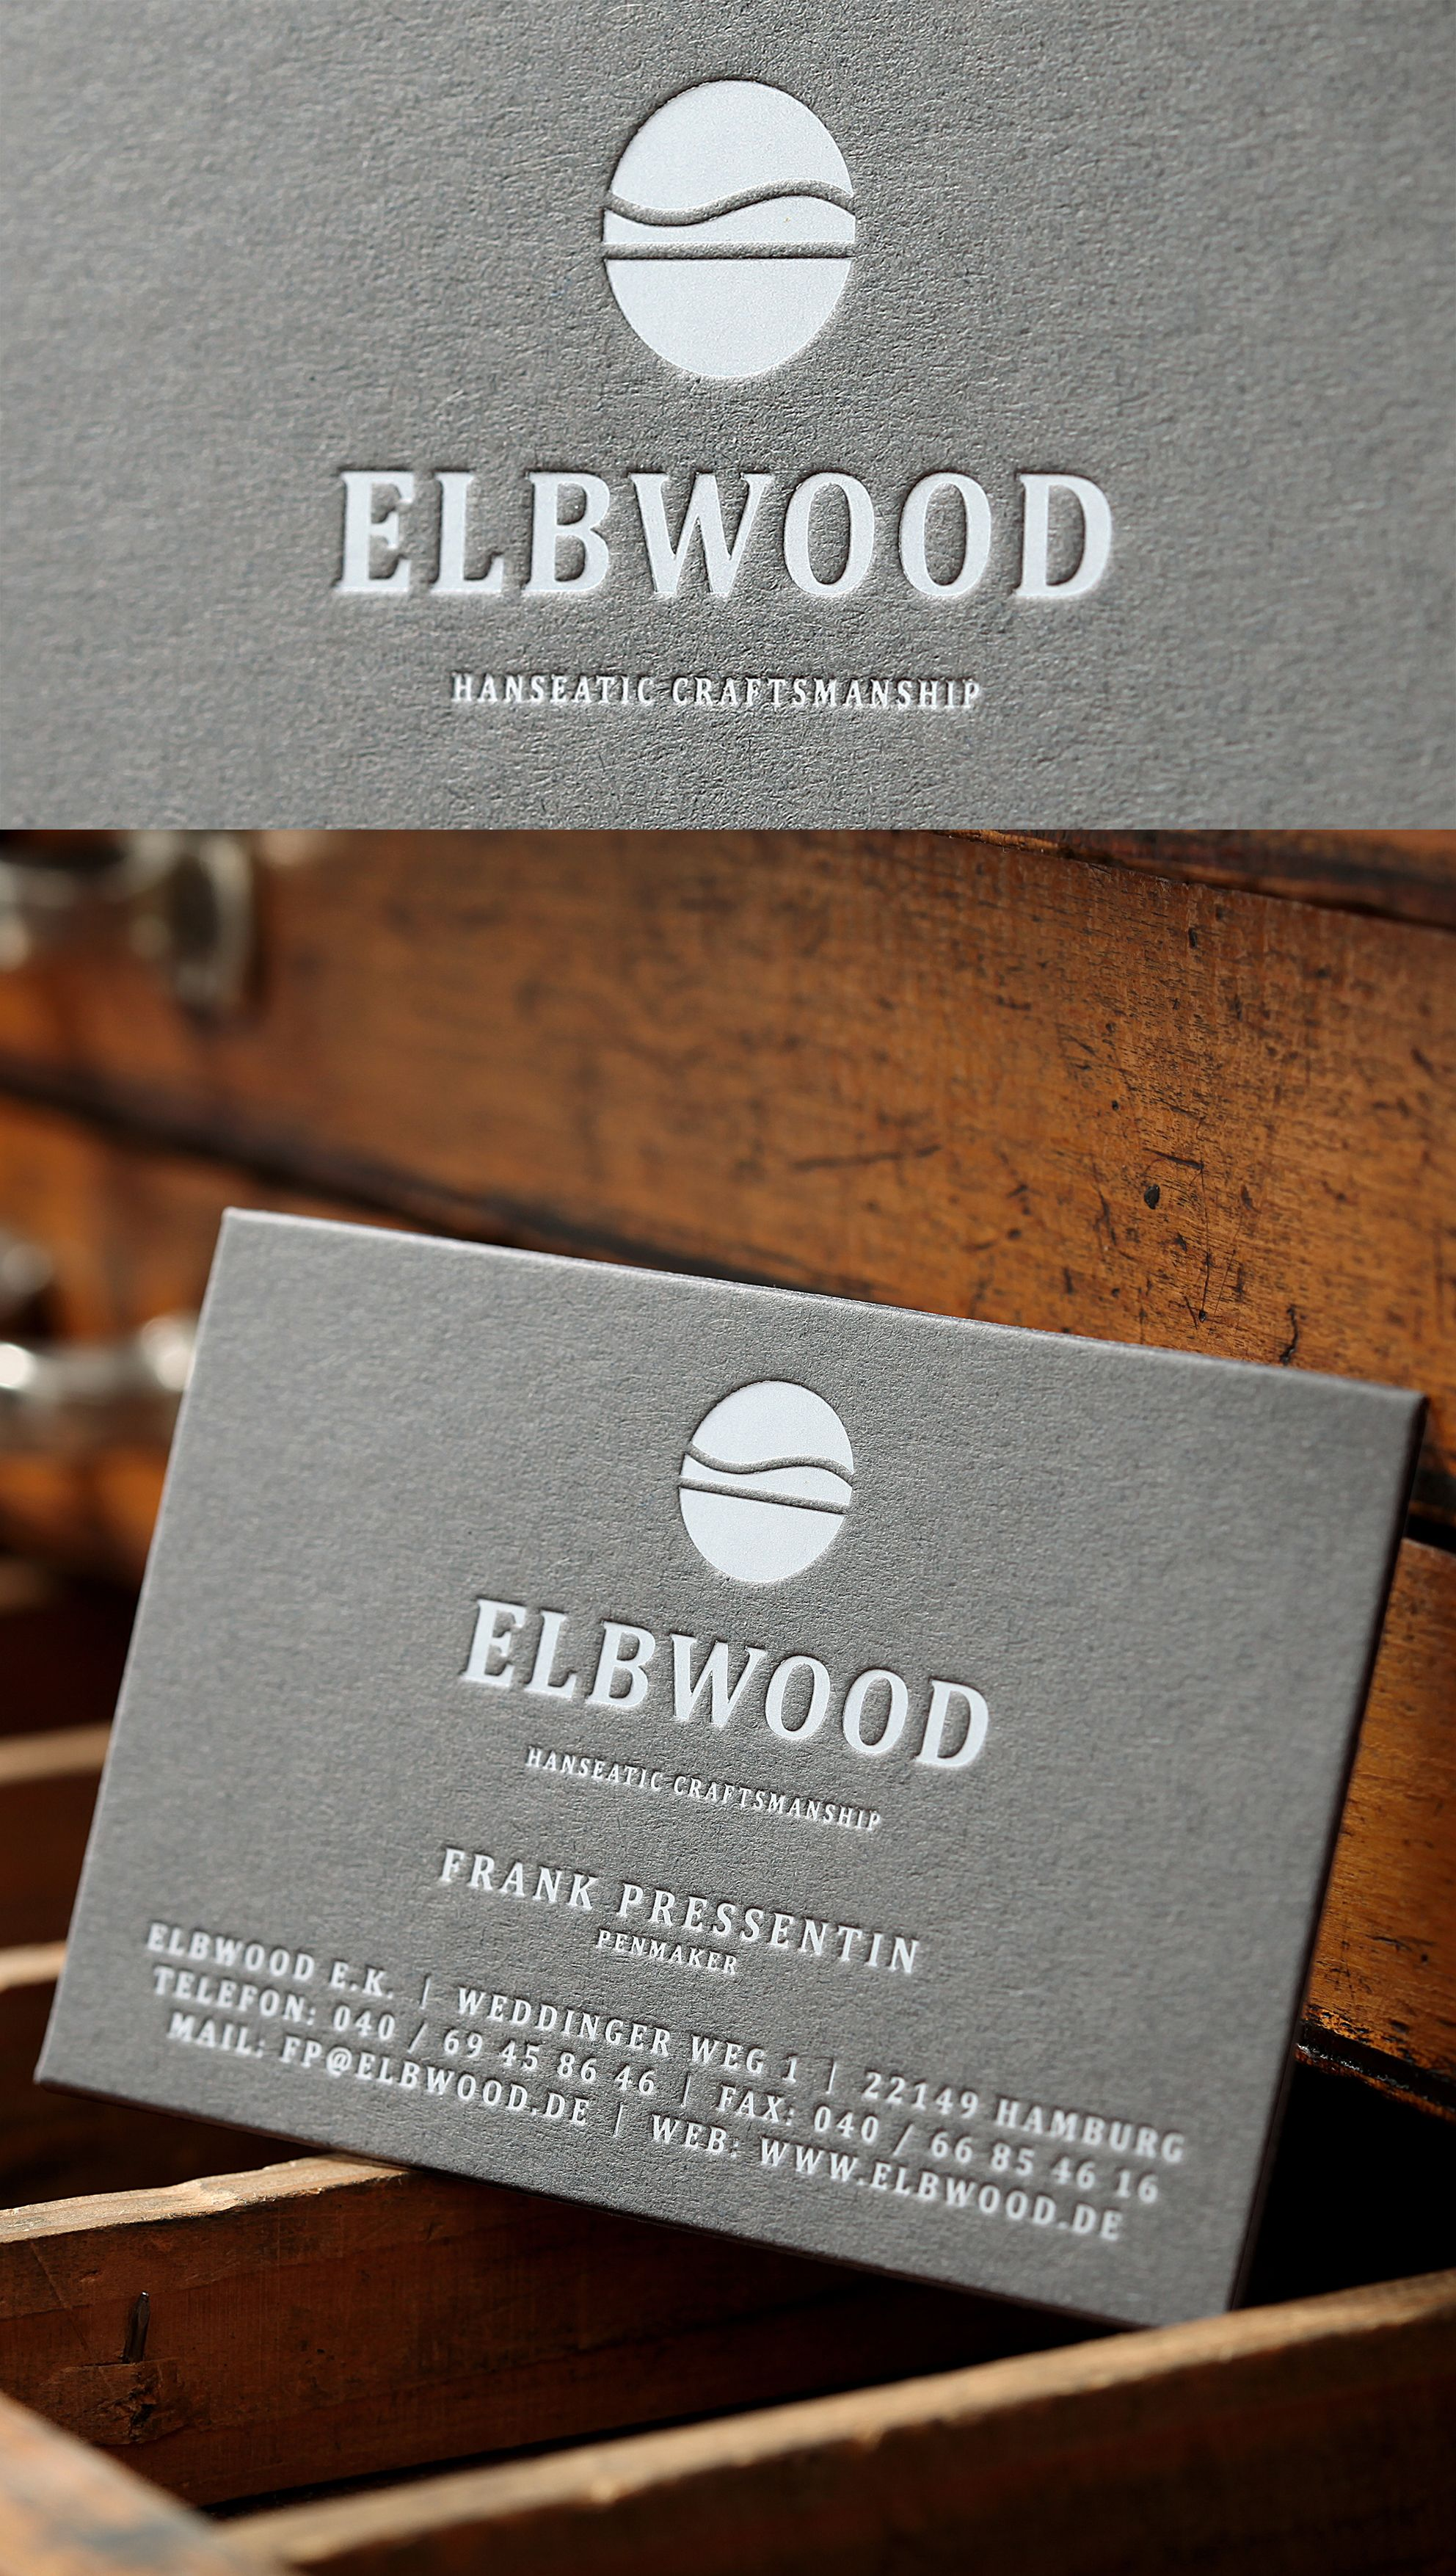 Great Design From Elbwood The Hanseatic Penmaker Business